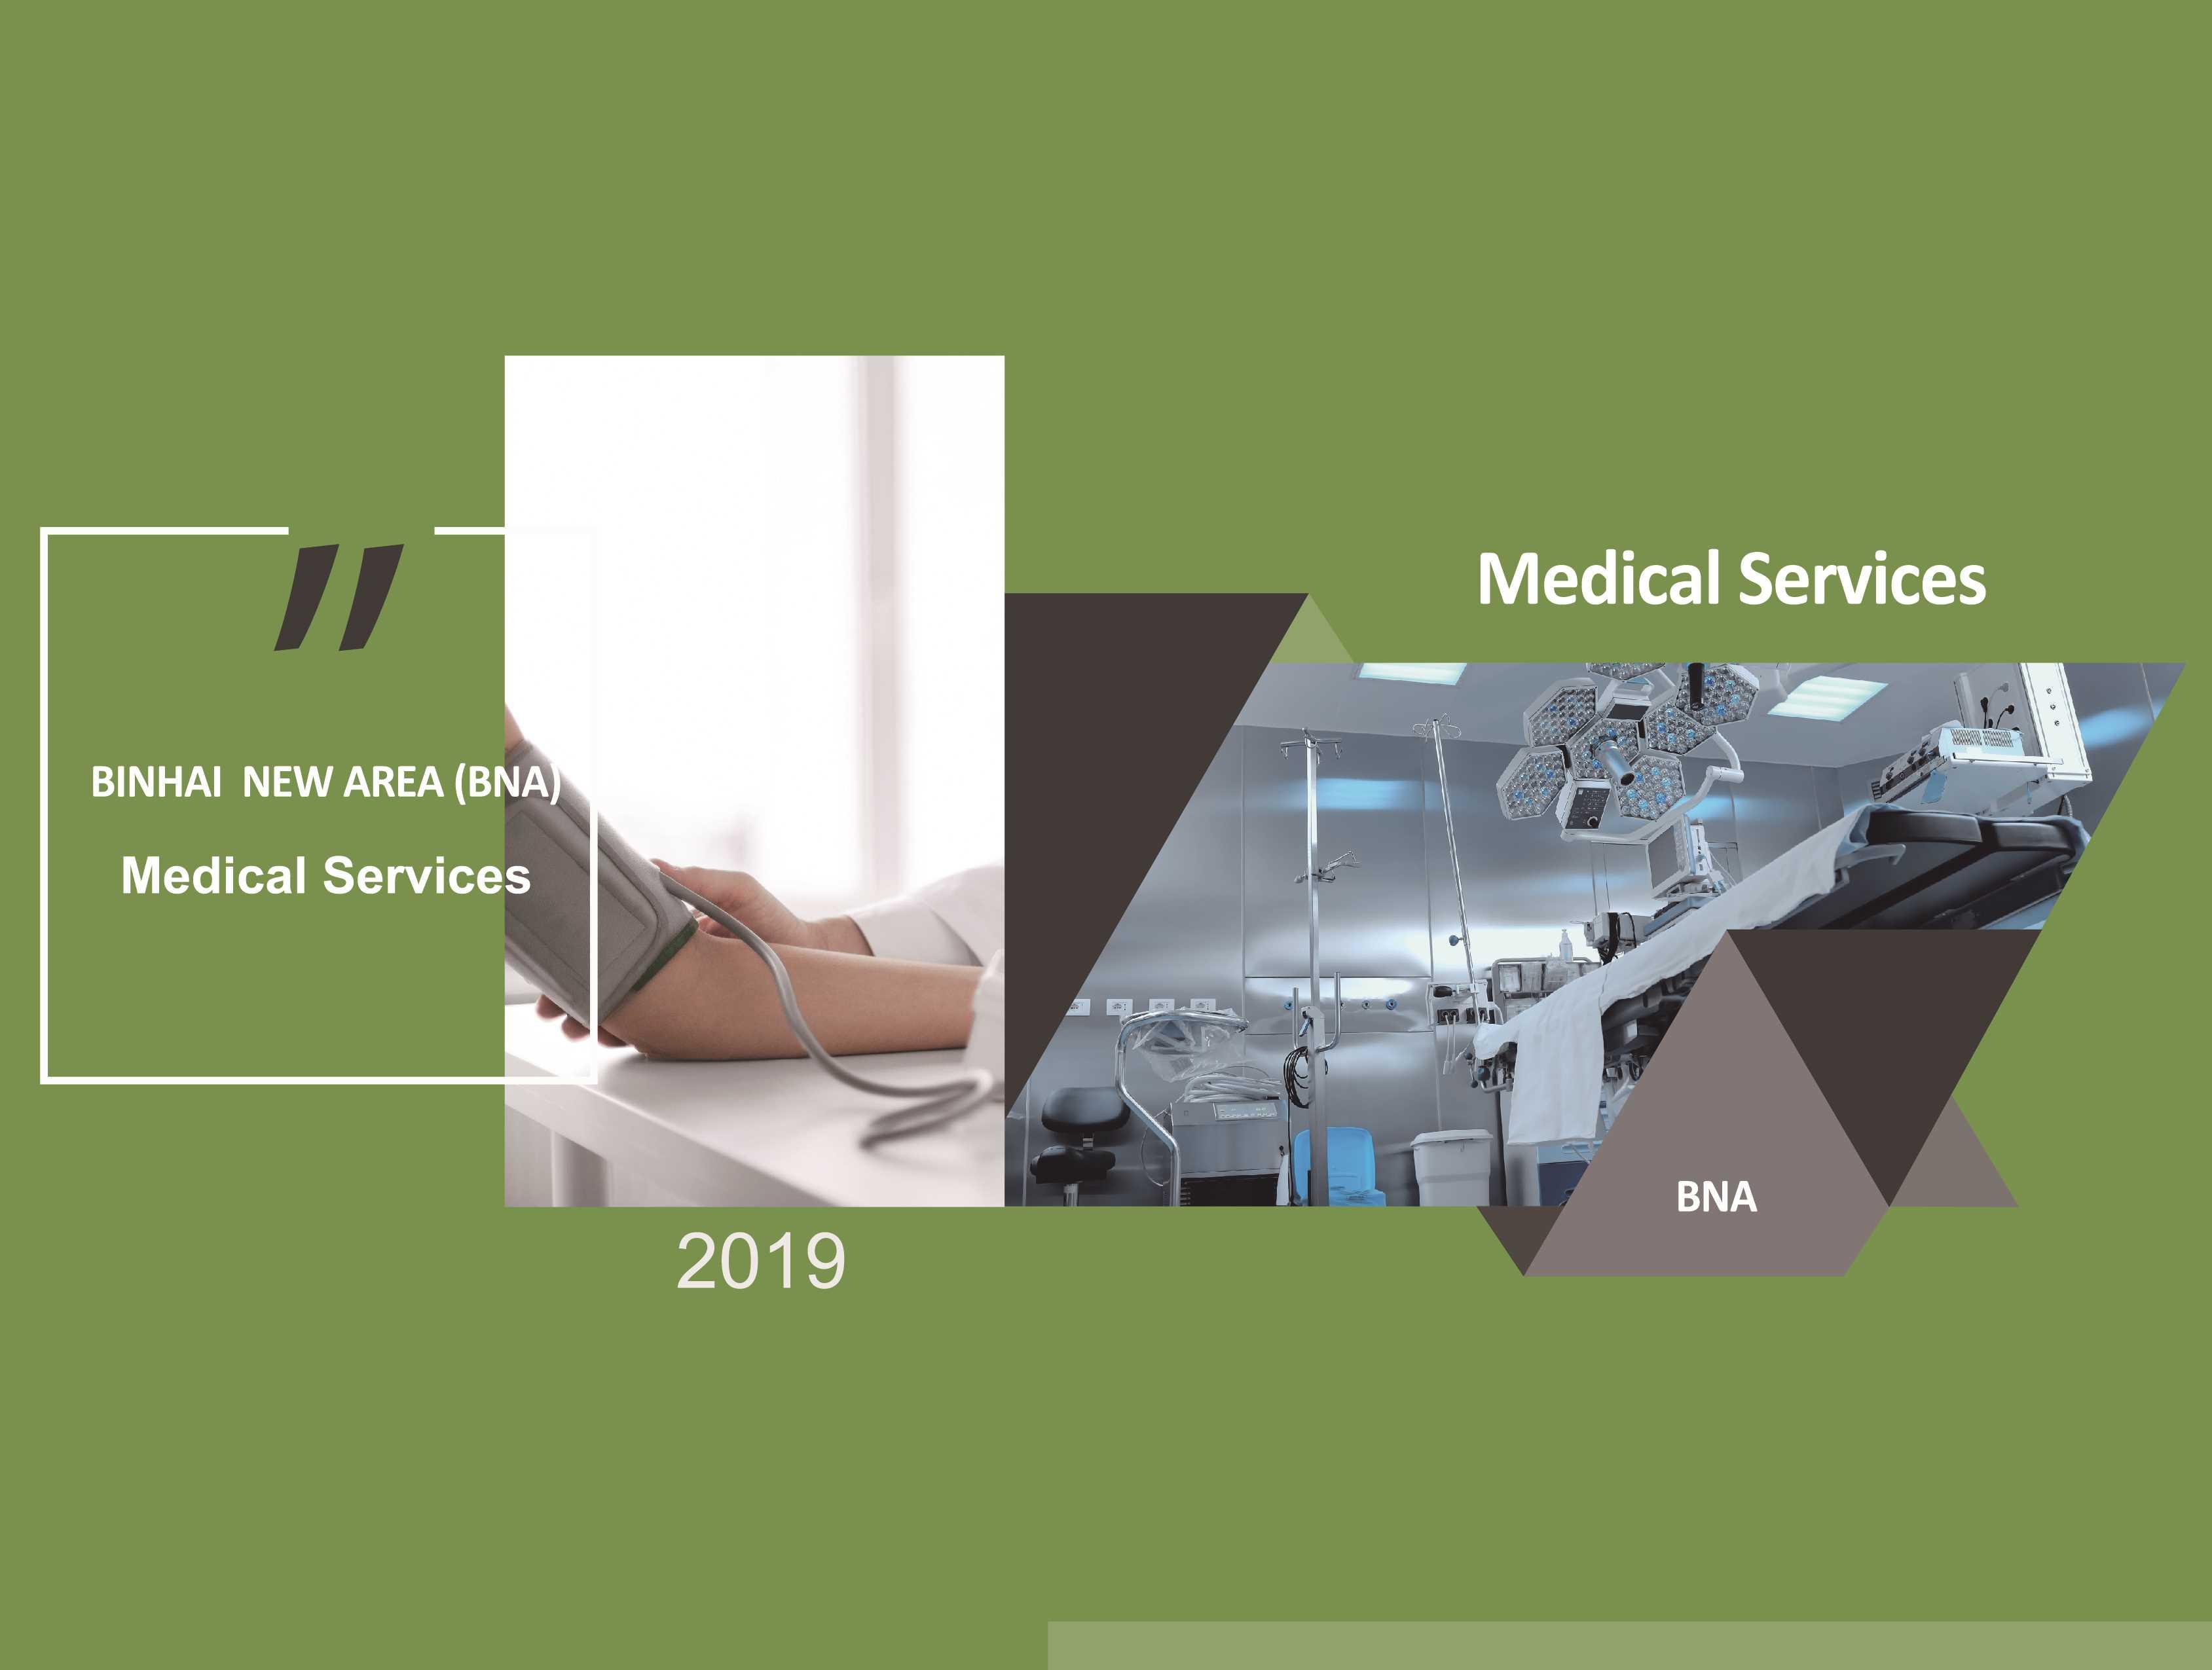 大册A2滨海新区MedicalServices-01